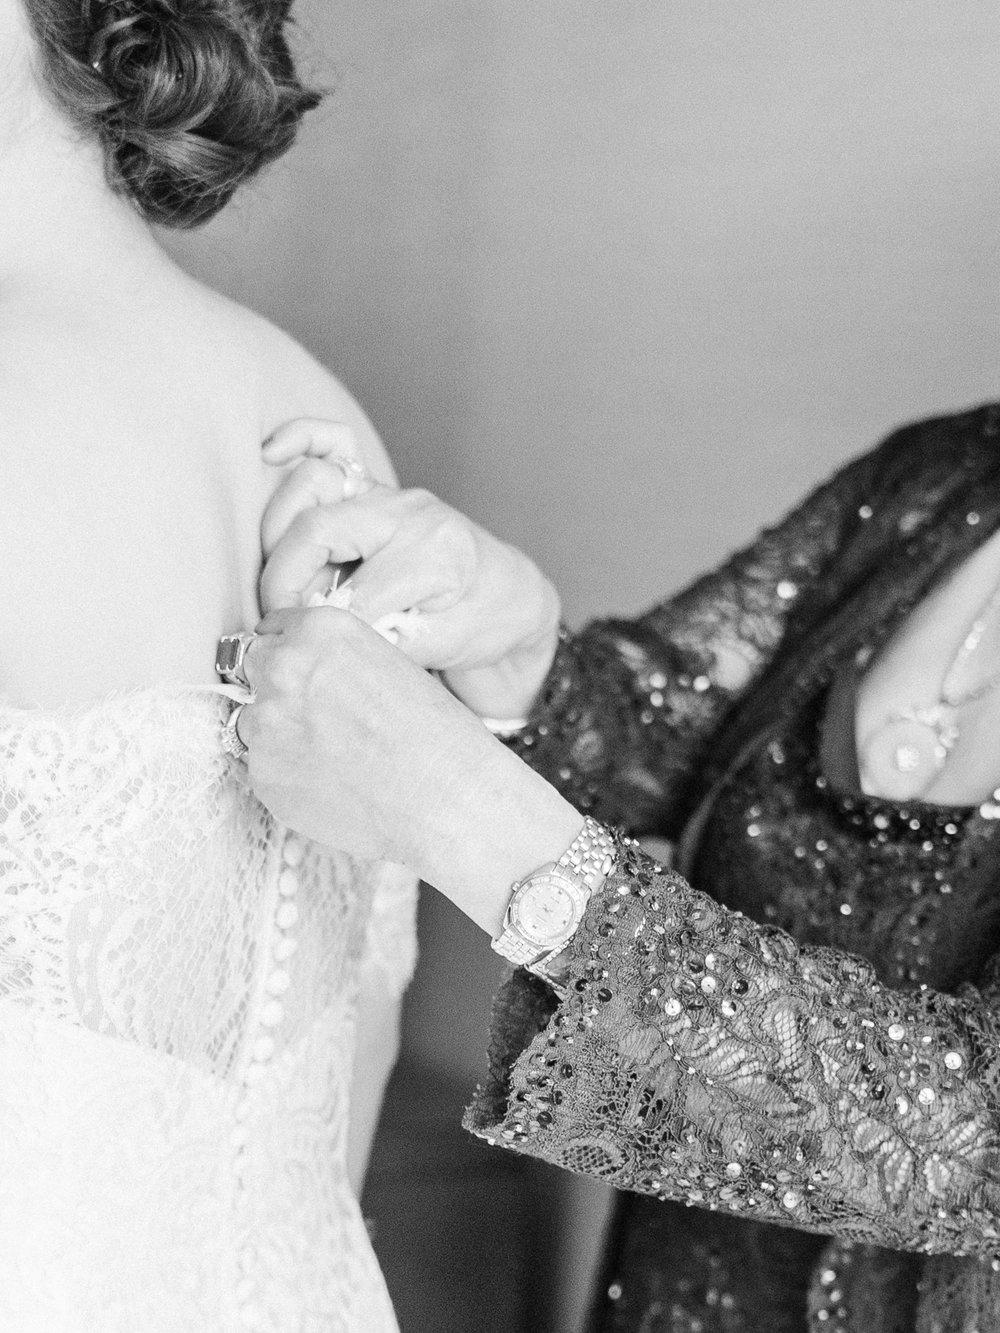 hannah-cochran-photography-joe-and-susan-wedding-31.jpg